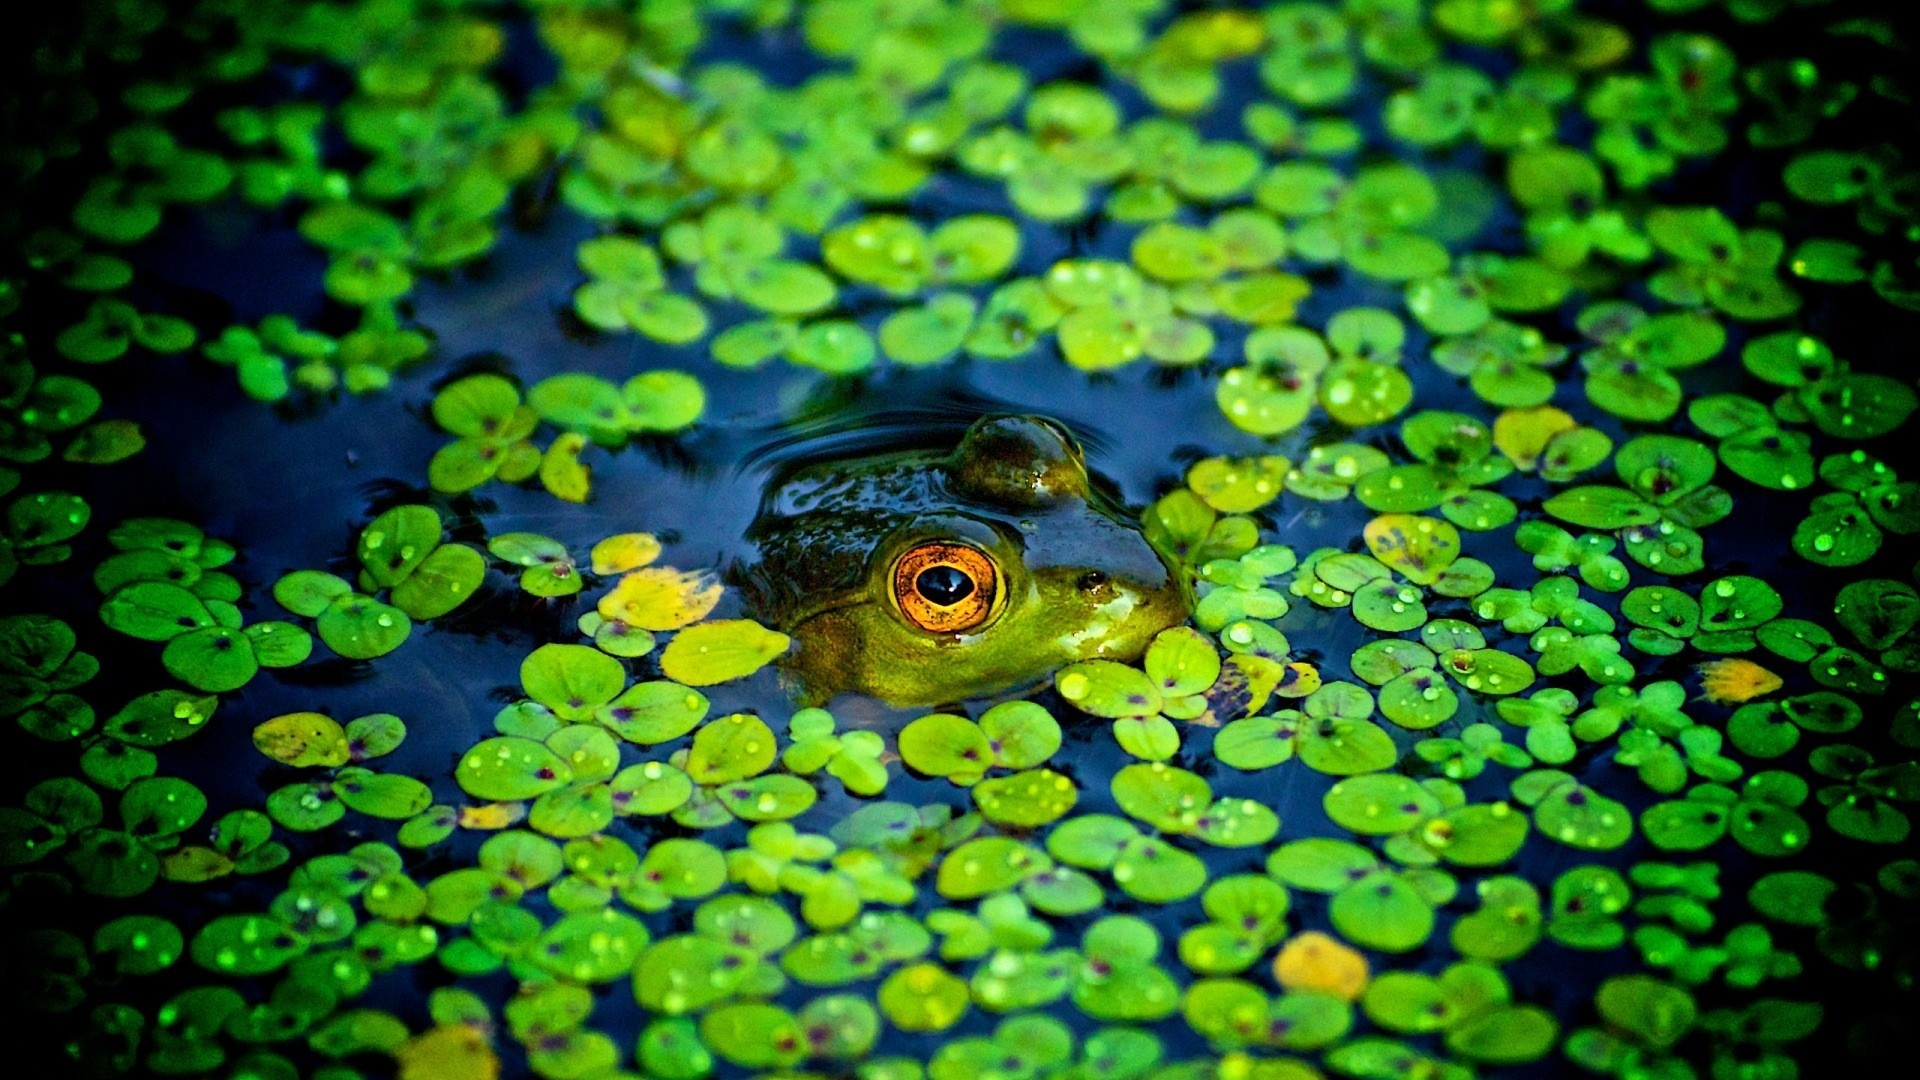 Frog Wallpaper image hd